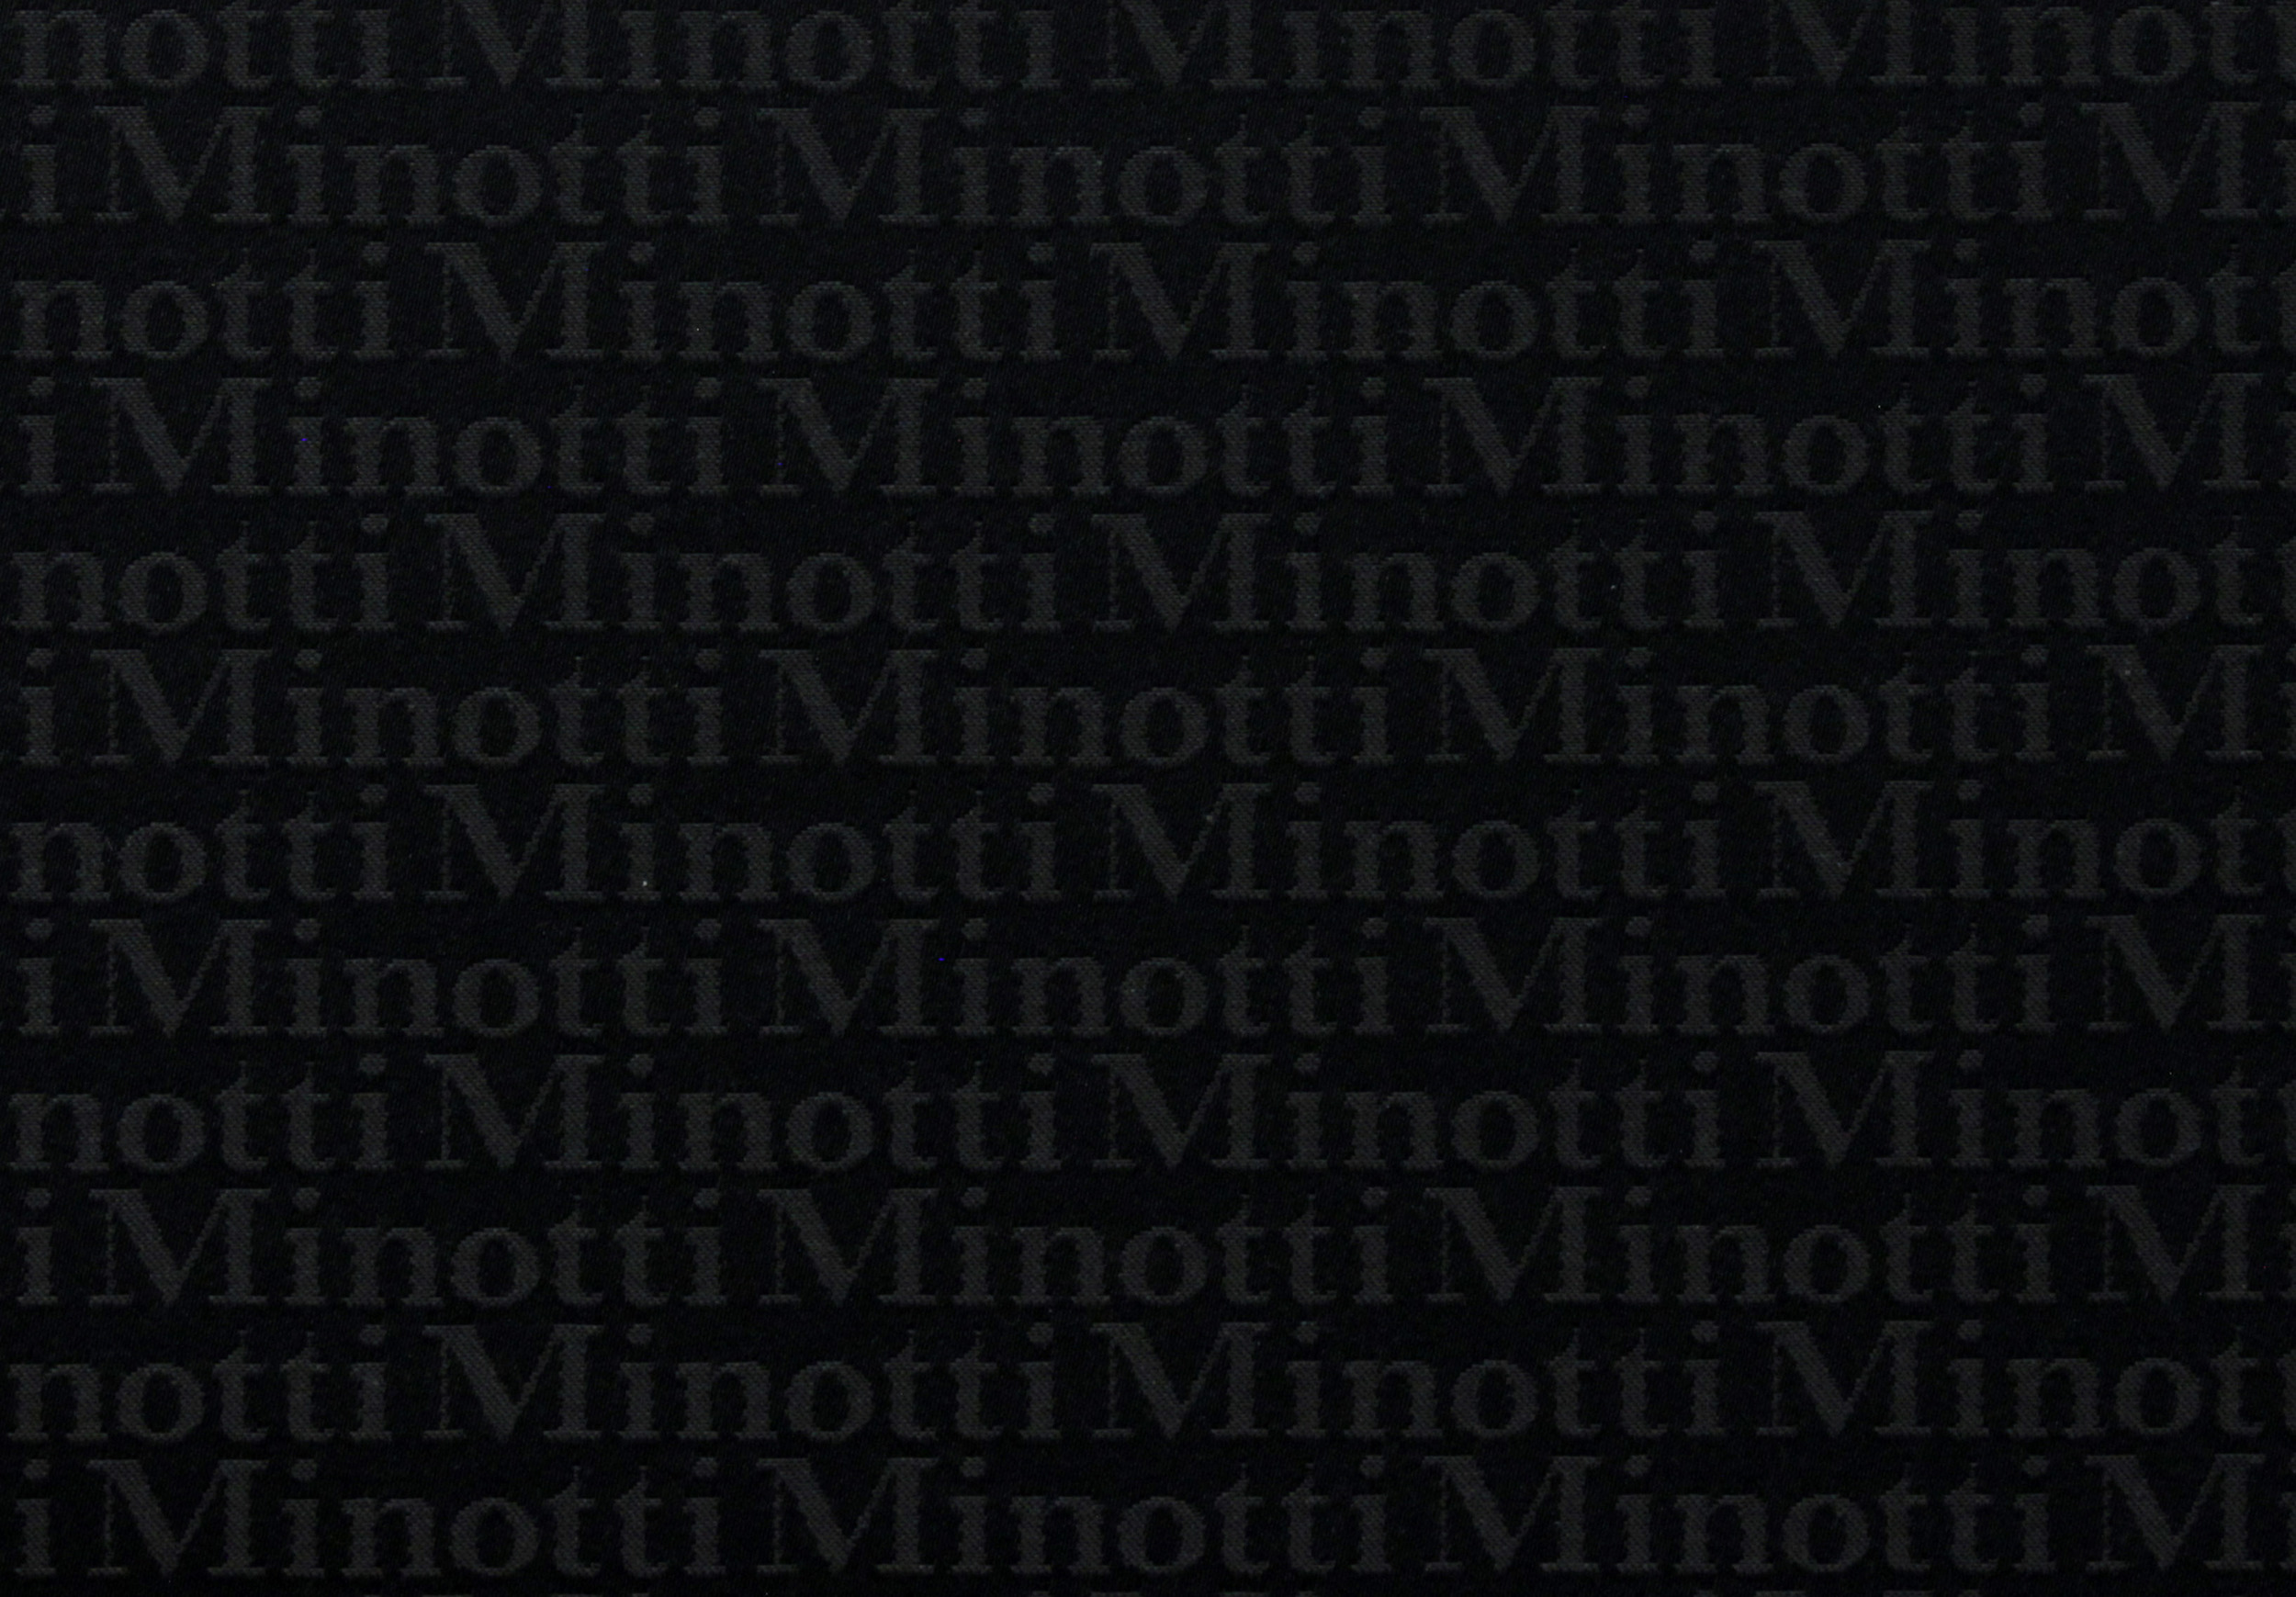 Minotti 65 cleanline lthr clubchairs54 detail7 hires.JPG